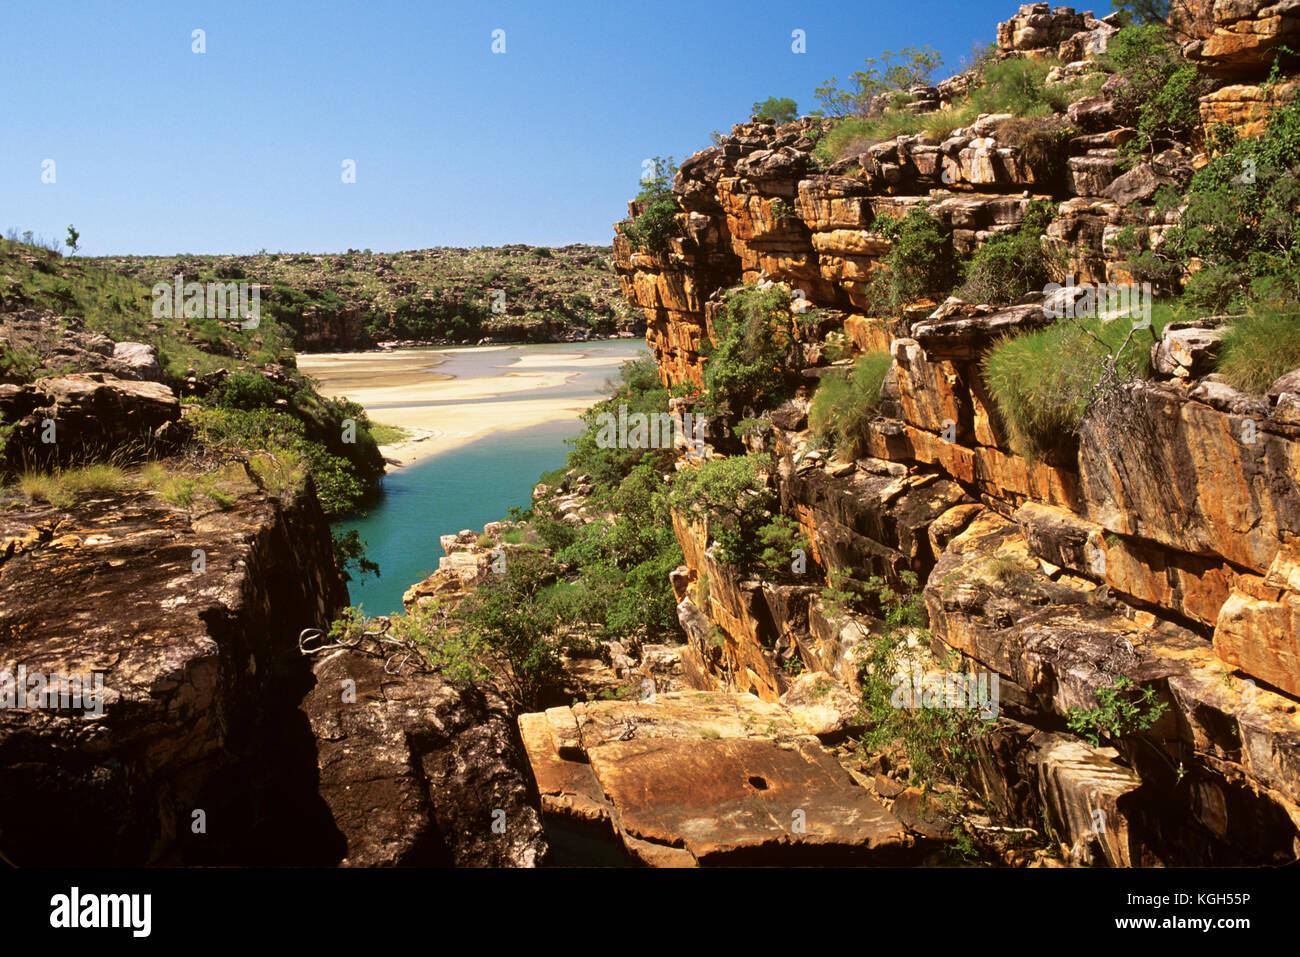 Sandstone escarpment and coast where mangroves border the tidal zone. Kimberley region, Western Australia, Australia Stock Photo